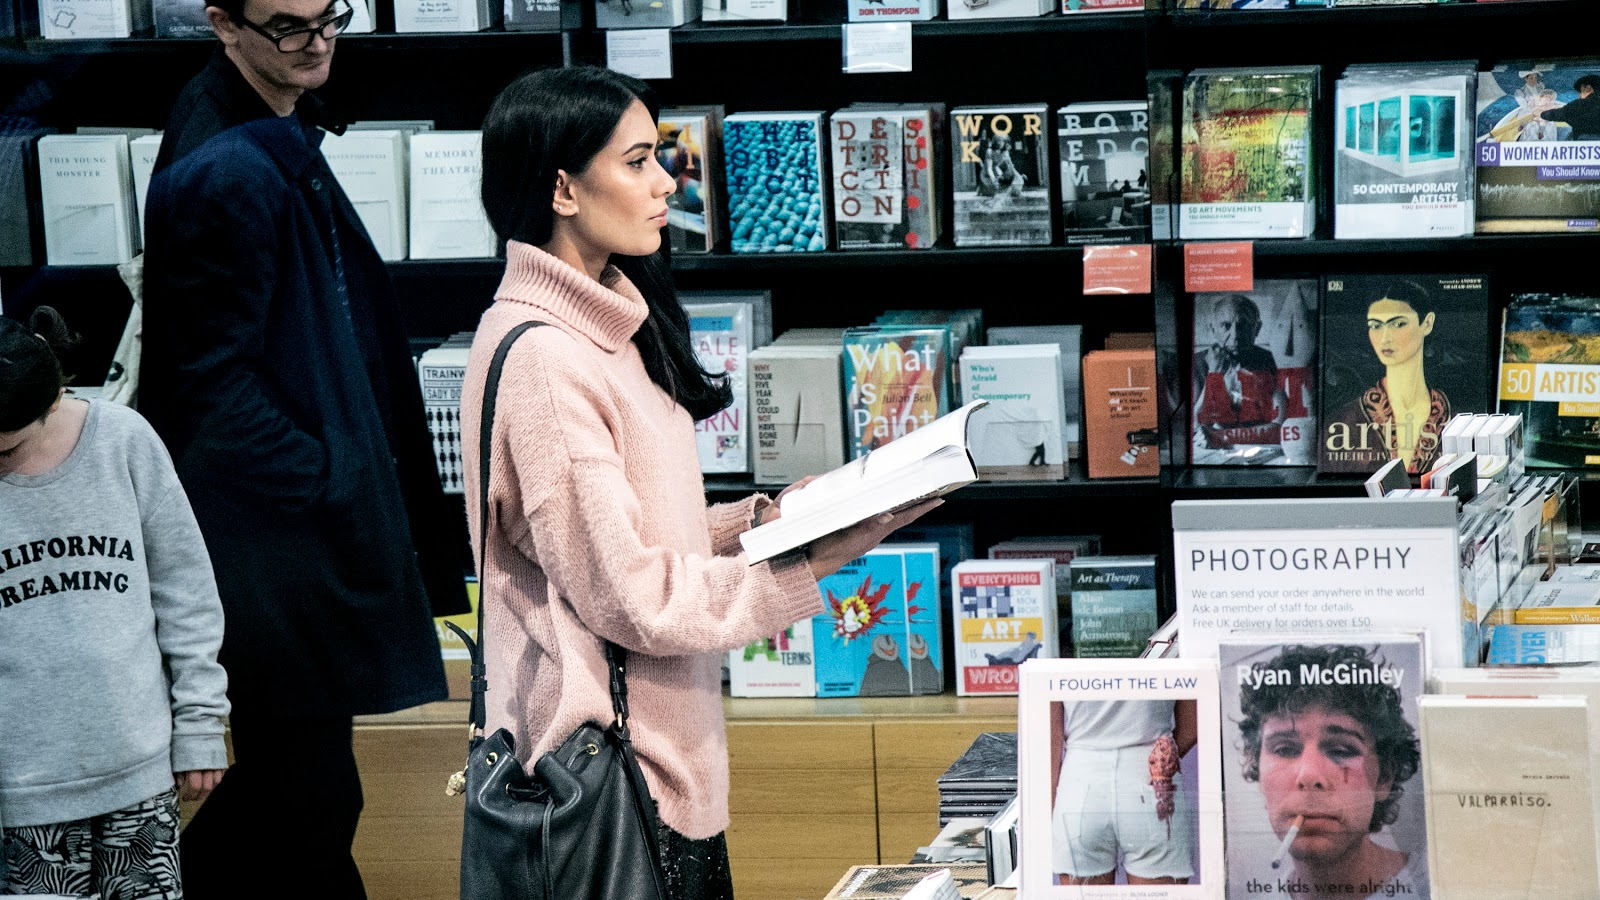 London blogger Reena Rai shot at the Tate Modern